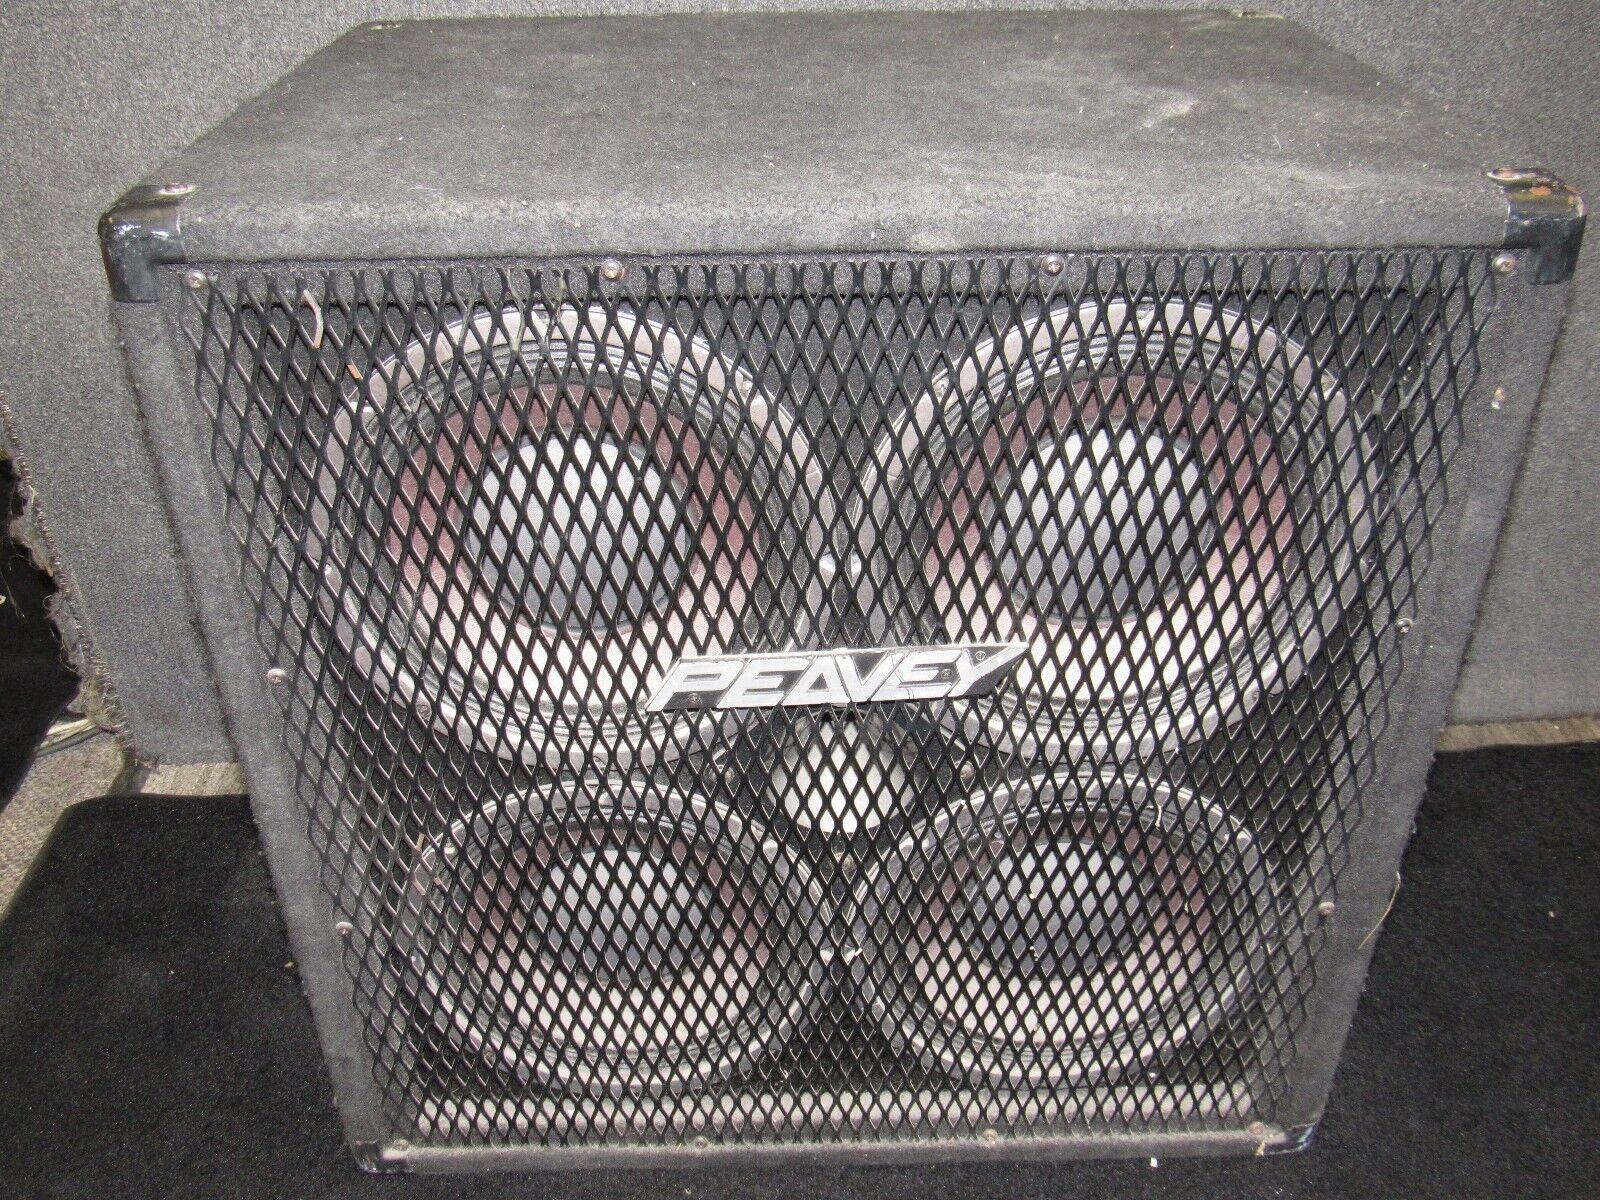 Peavey 410TX 8-ohm 700-watt Bass CAB Speaker Enclosure Cabinet 410 ...